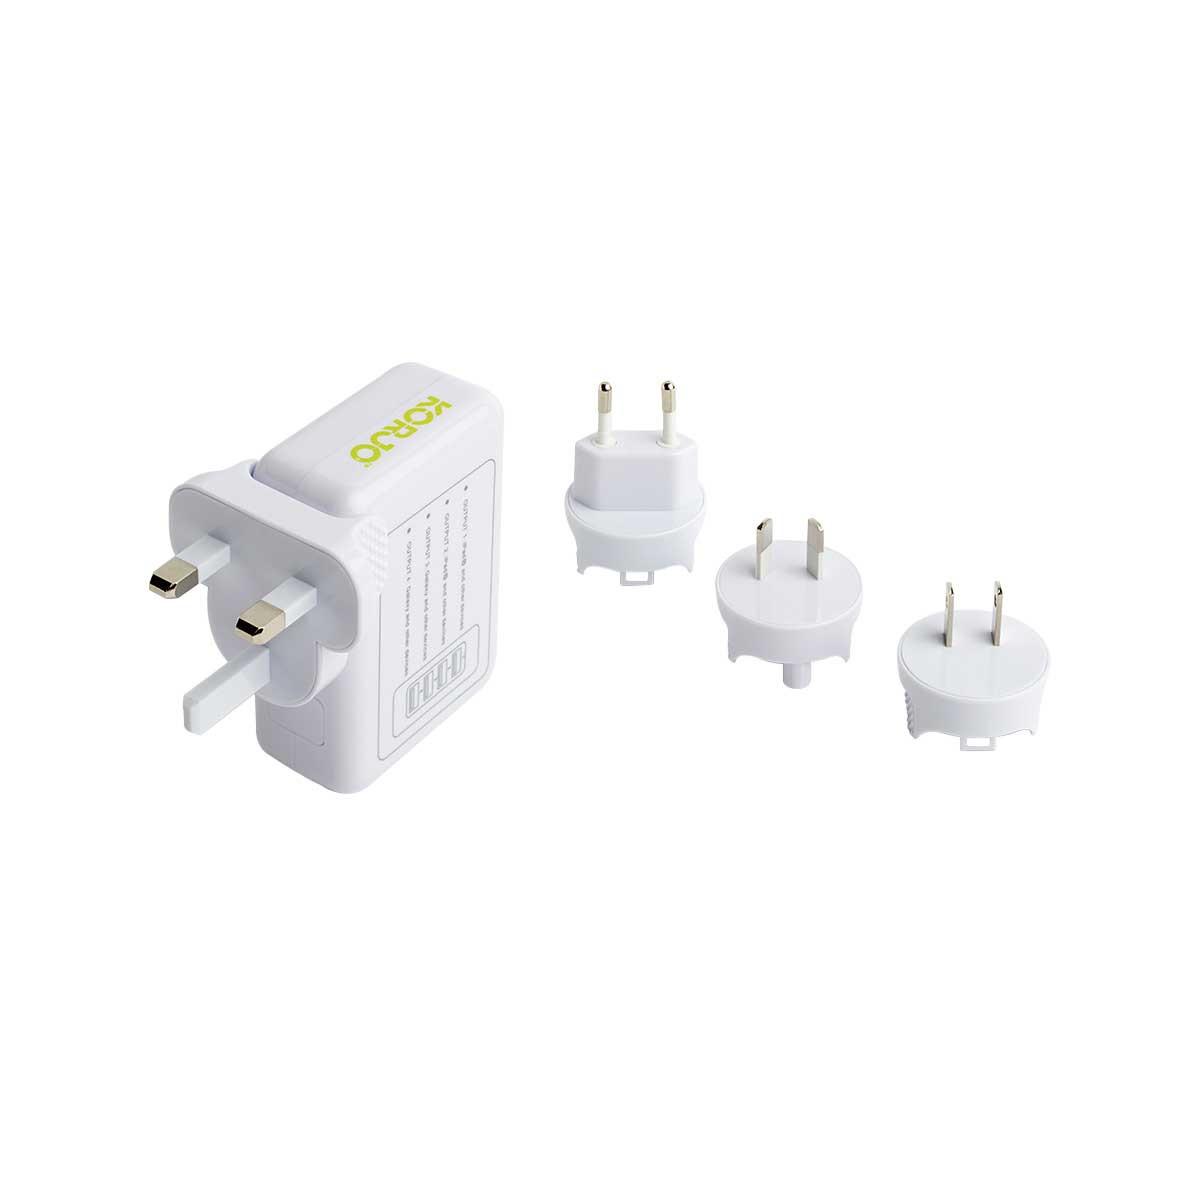 Korjo 4 port USB charger with international plugs